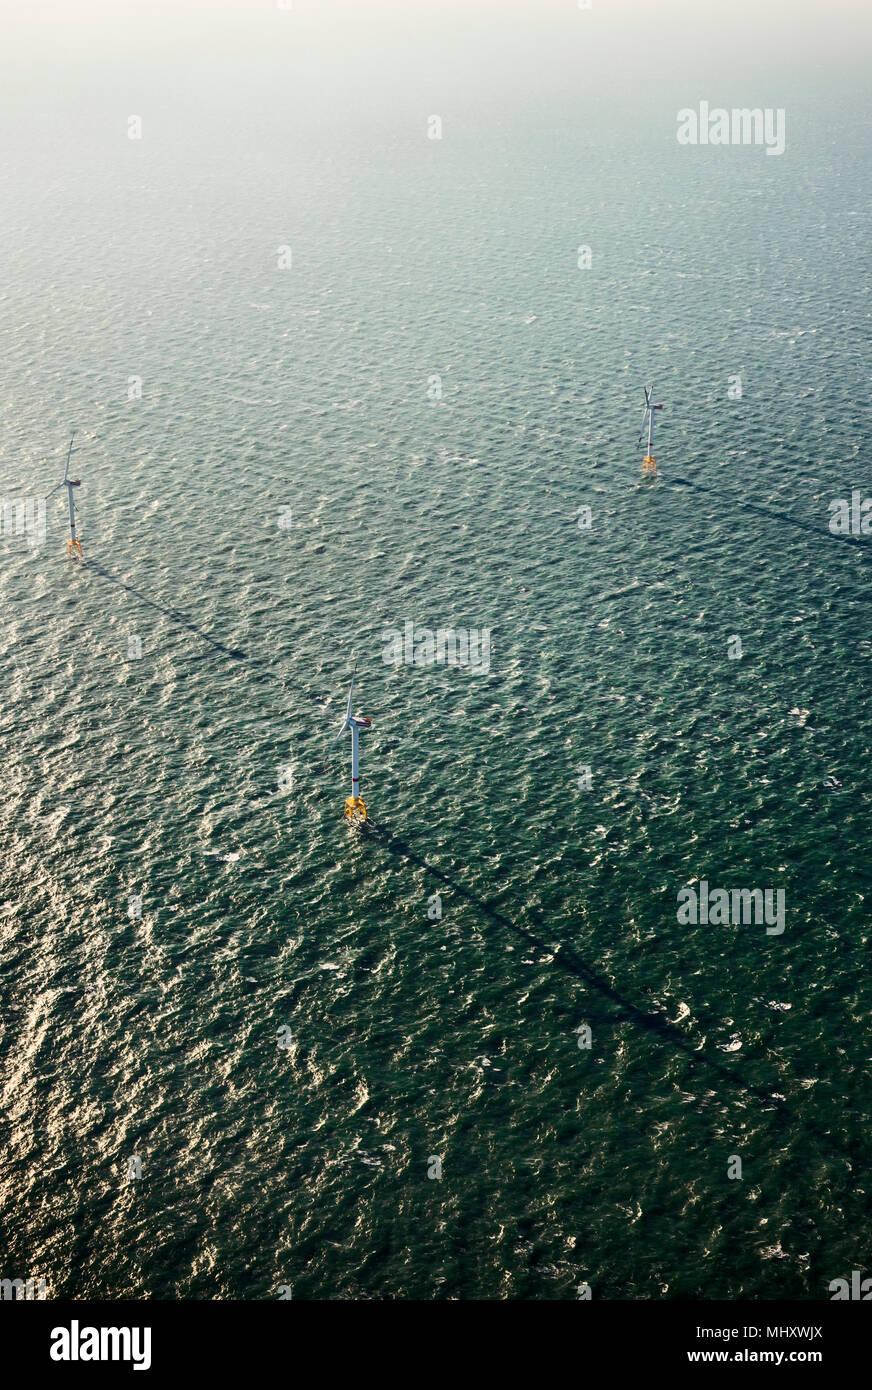 Per centrali eoliche offshore, Domburg, Zeeland, Paesi Bassi Immagini Stock